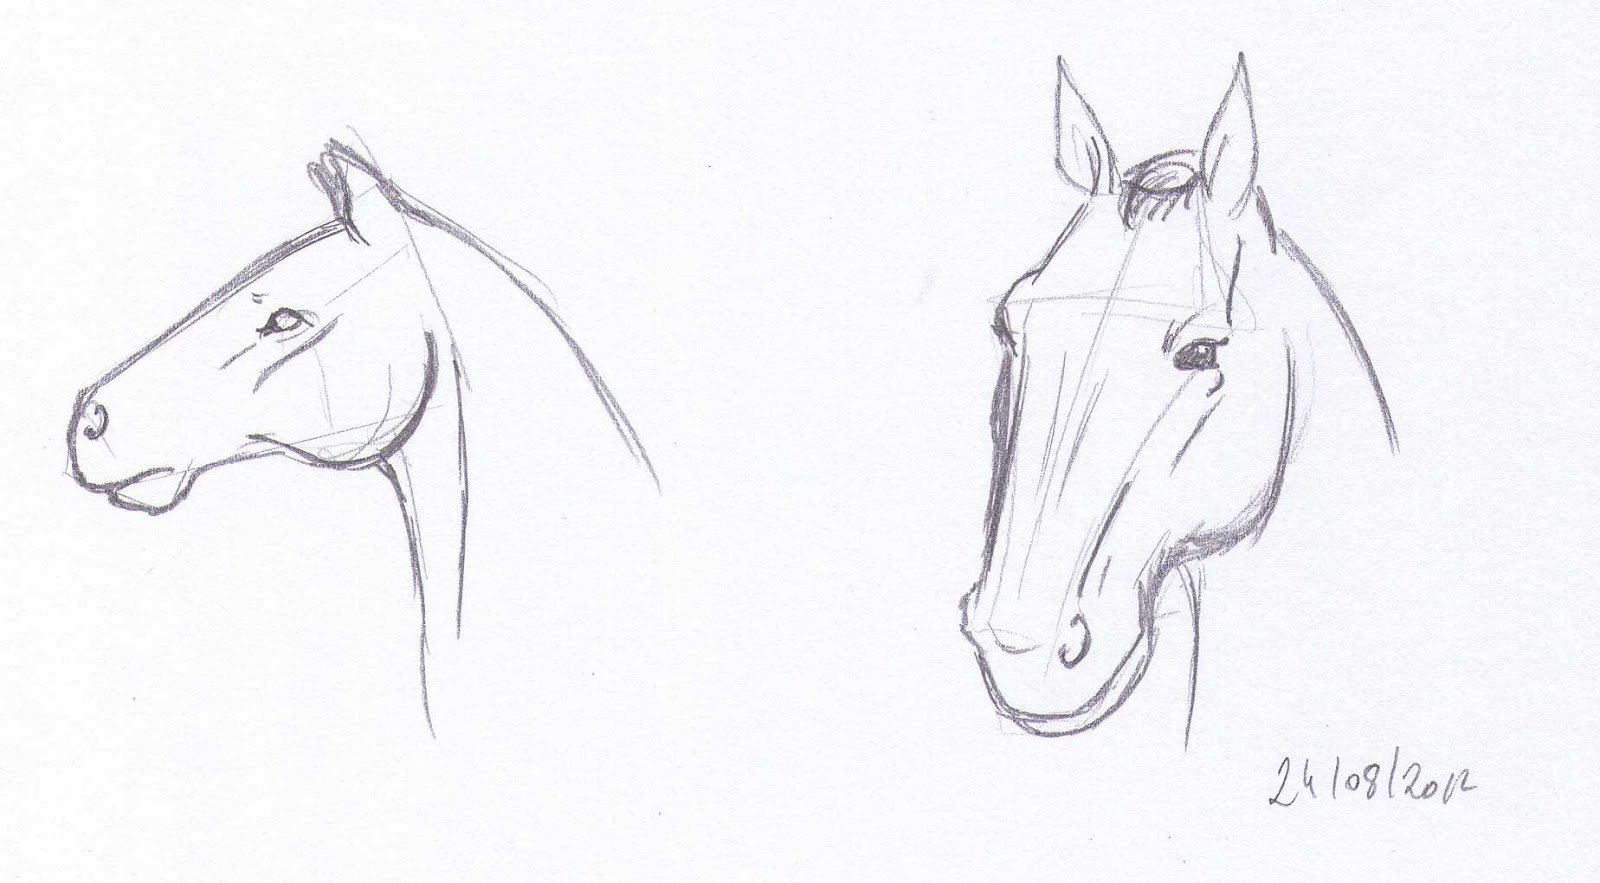 dessin de dessin de la tete d un cheval l duilawyerlosangeles dessin de dessin de la tete d un. Black Bedroom Furniture Sets. Home Design Ideas